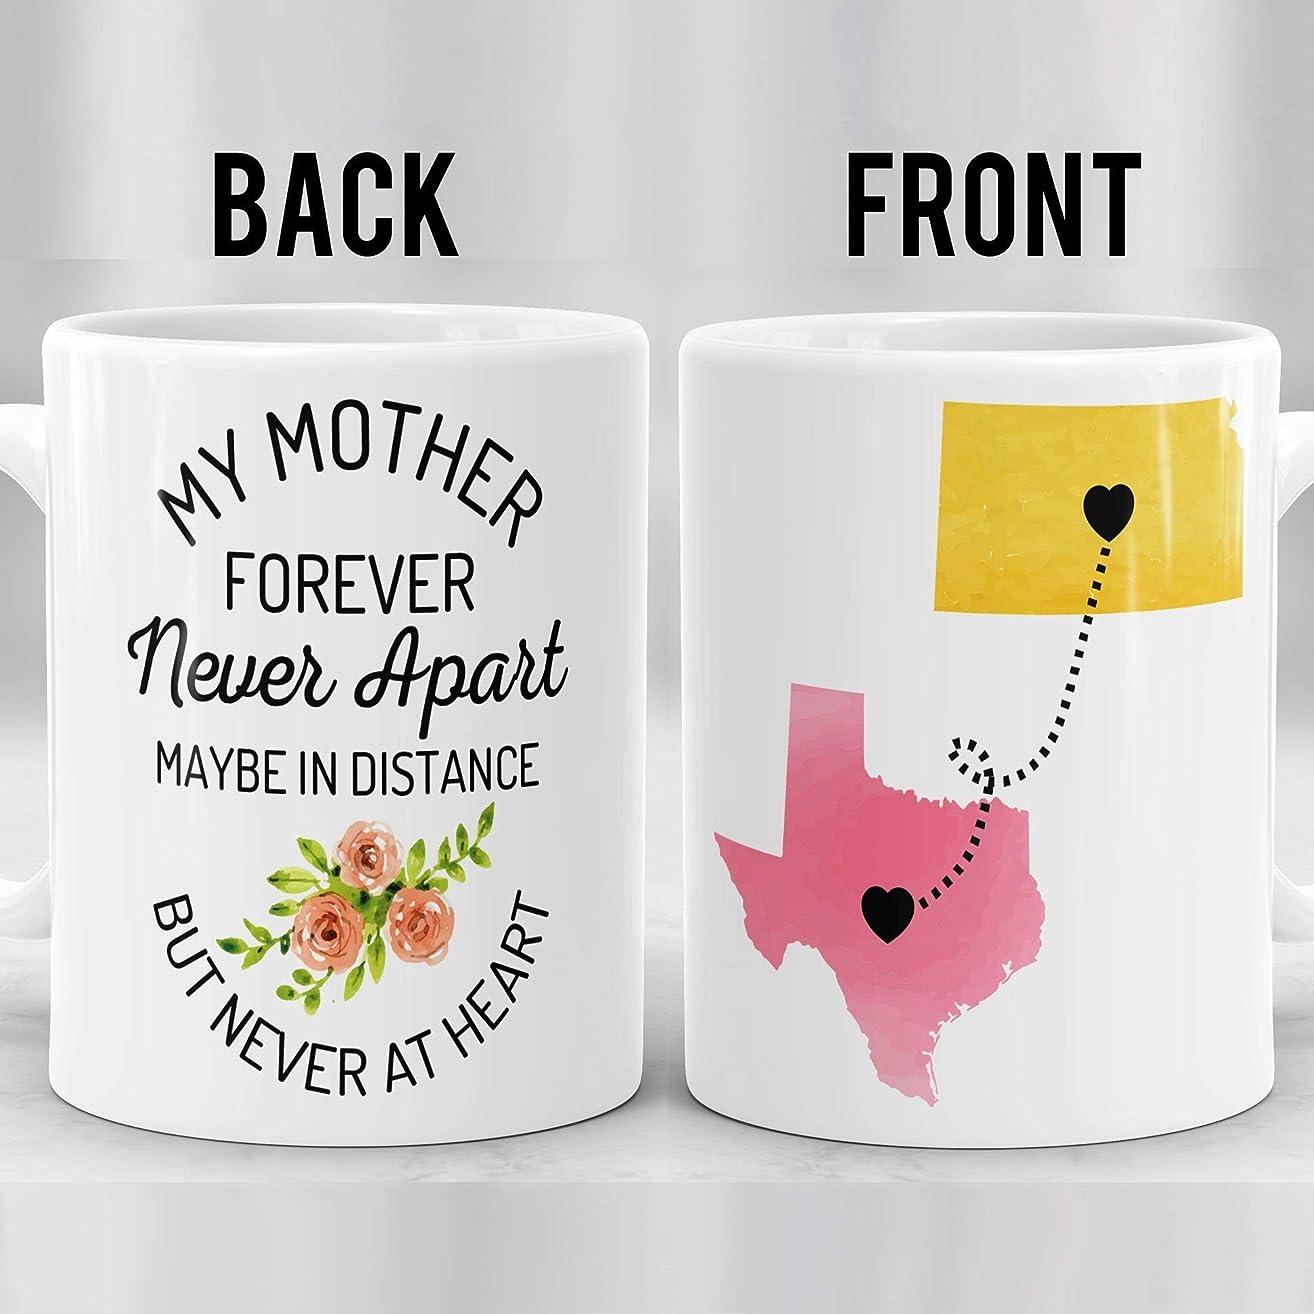 Gift For Mom, Long Distance Mug For Mother, Mother's Day Map, State to State Mug, Gift for Mother's Day, Mom Mug, Birthday Gift for Mom